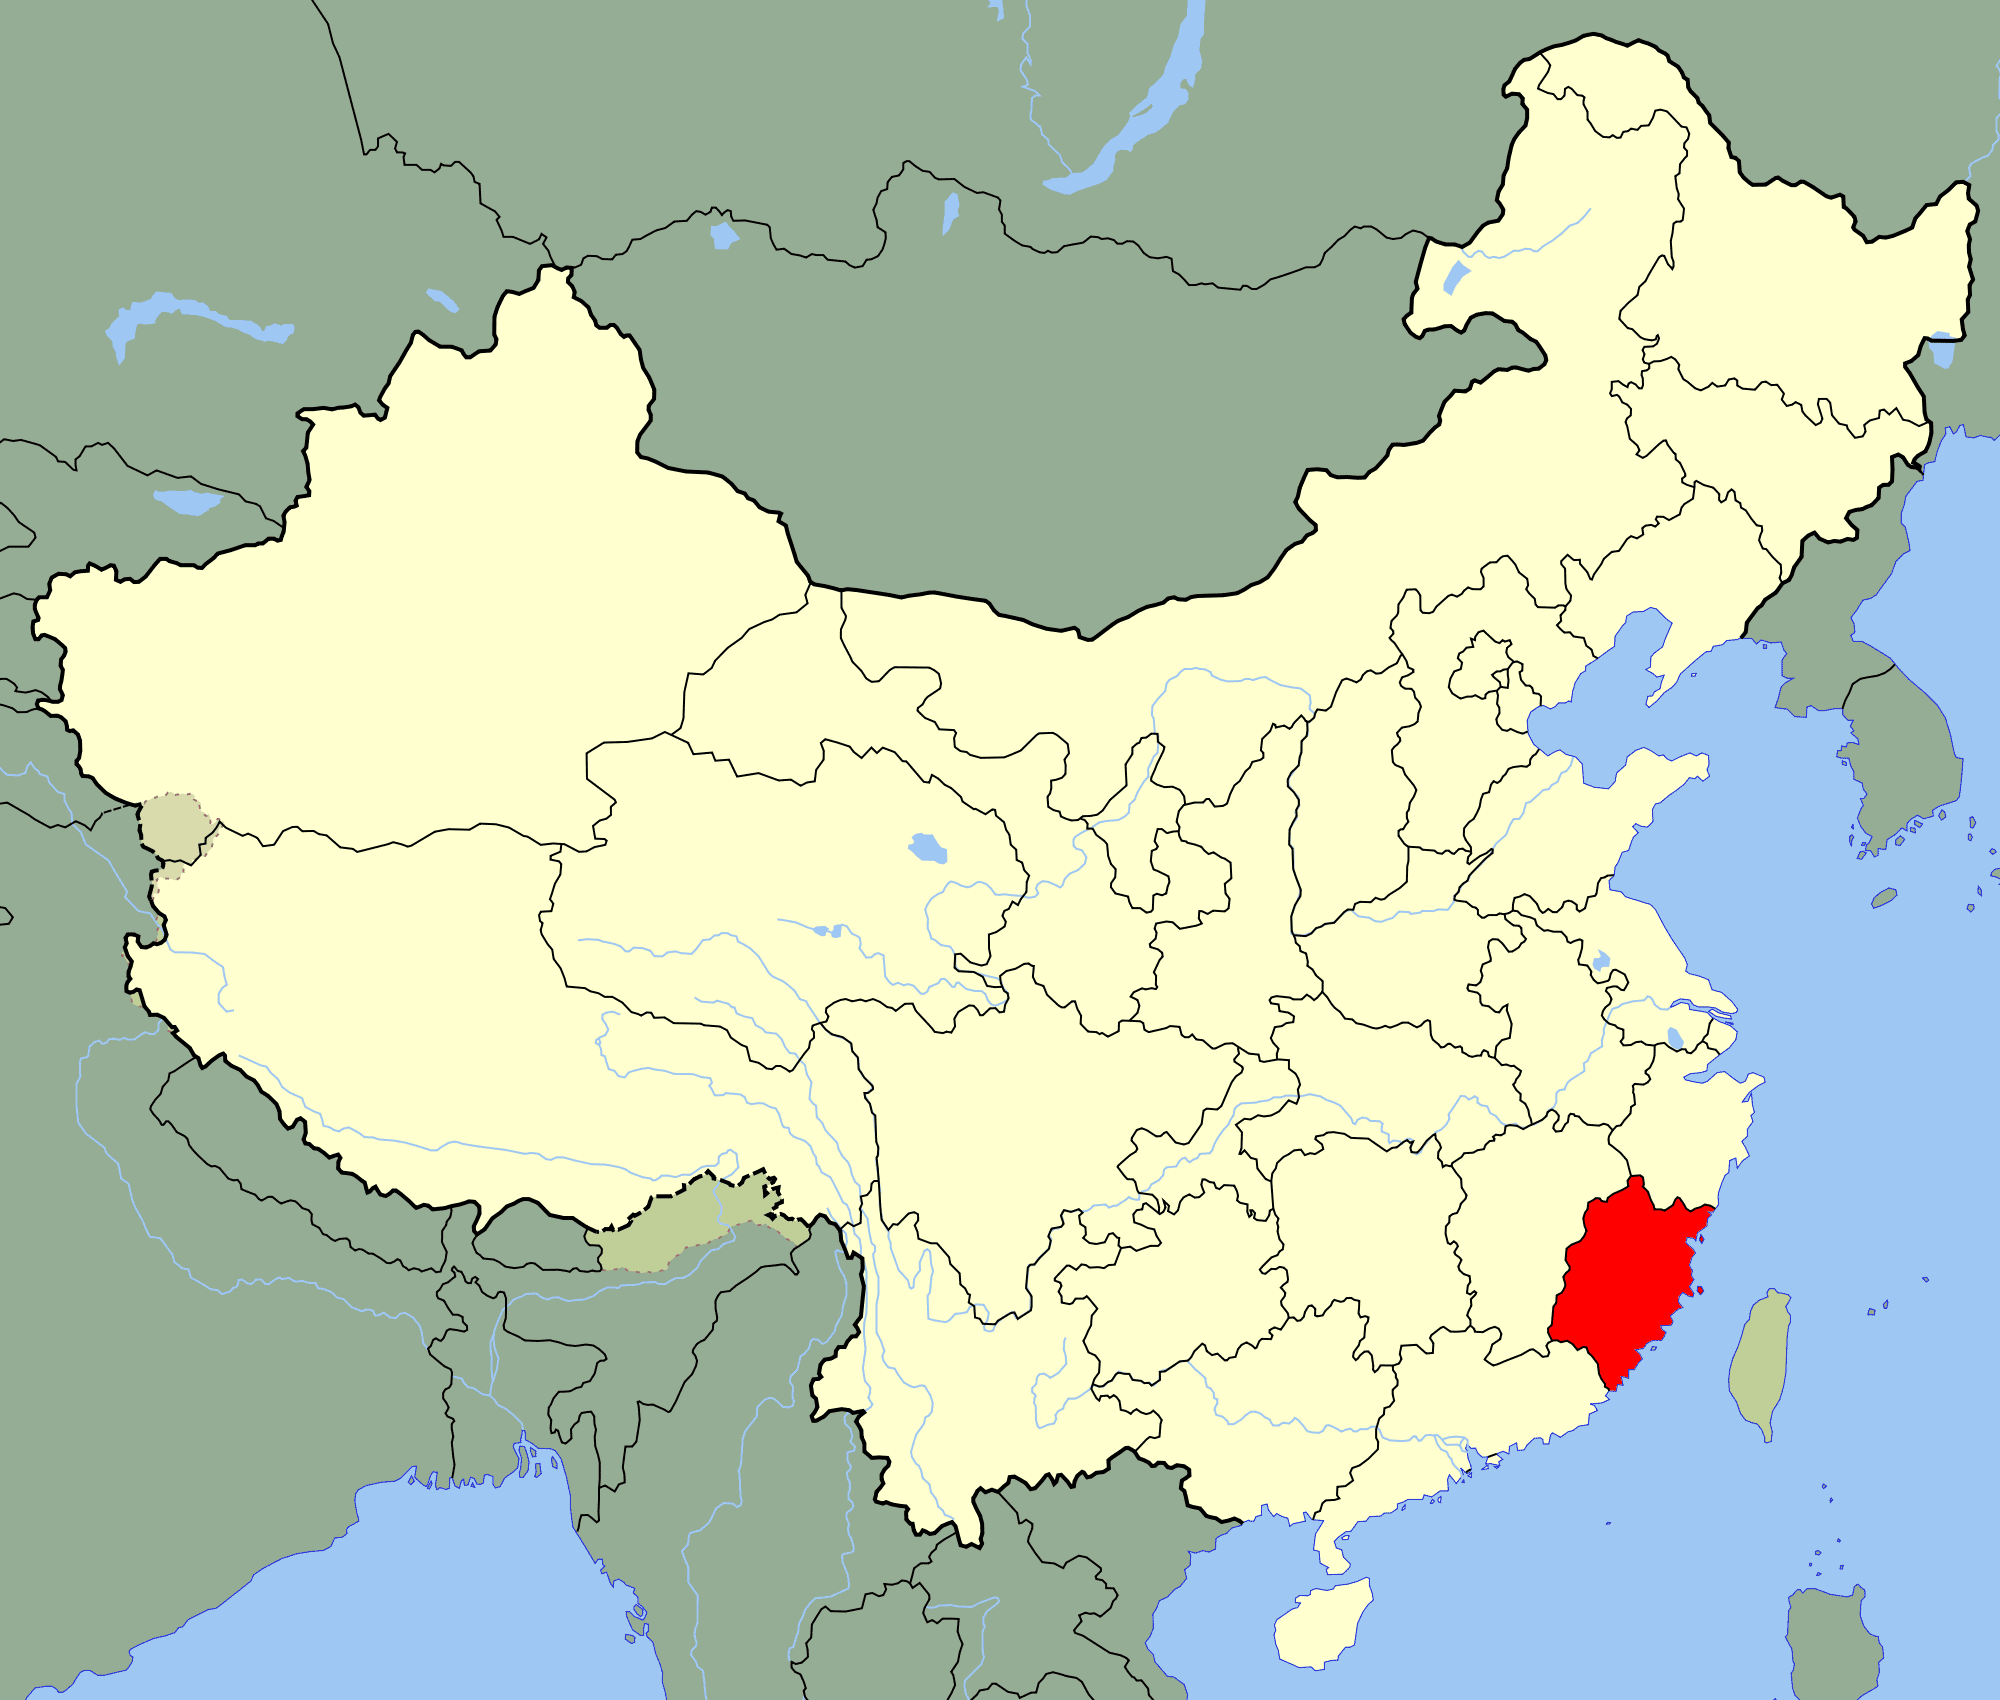 China_Fujian_location_map.png